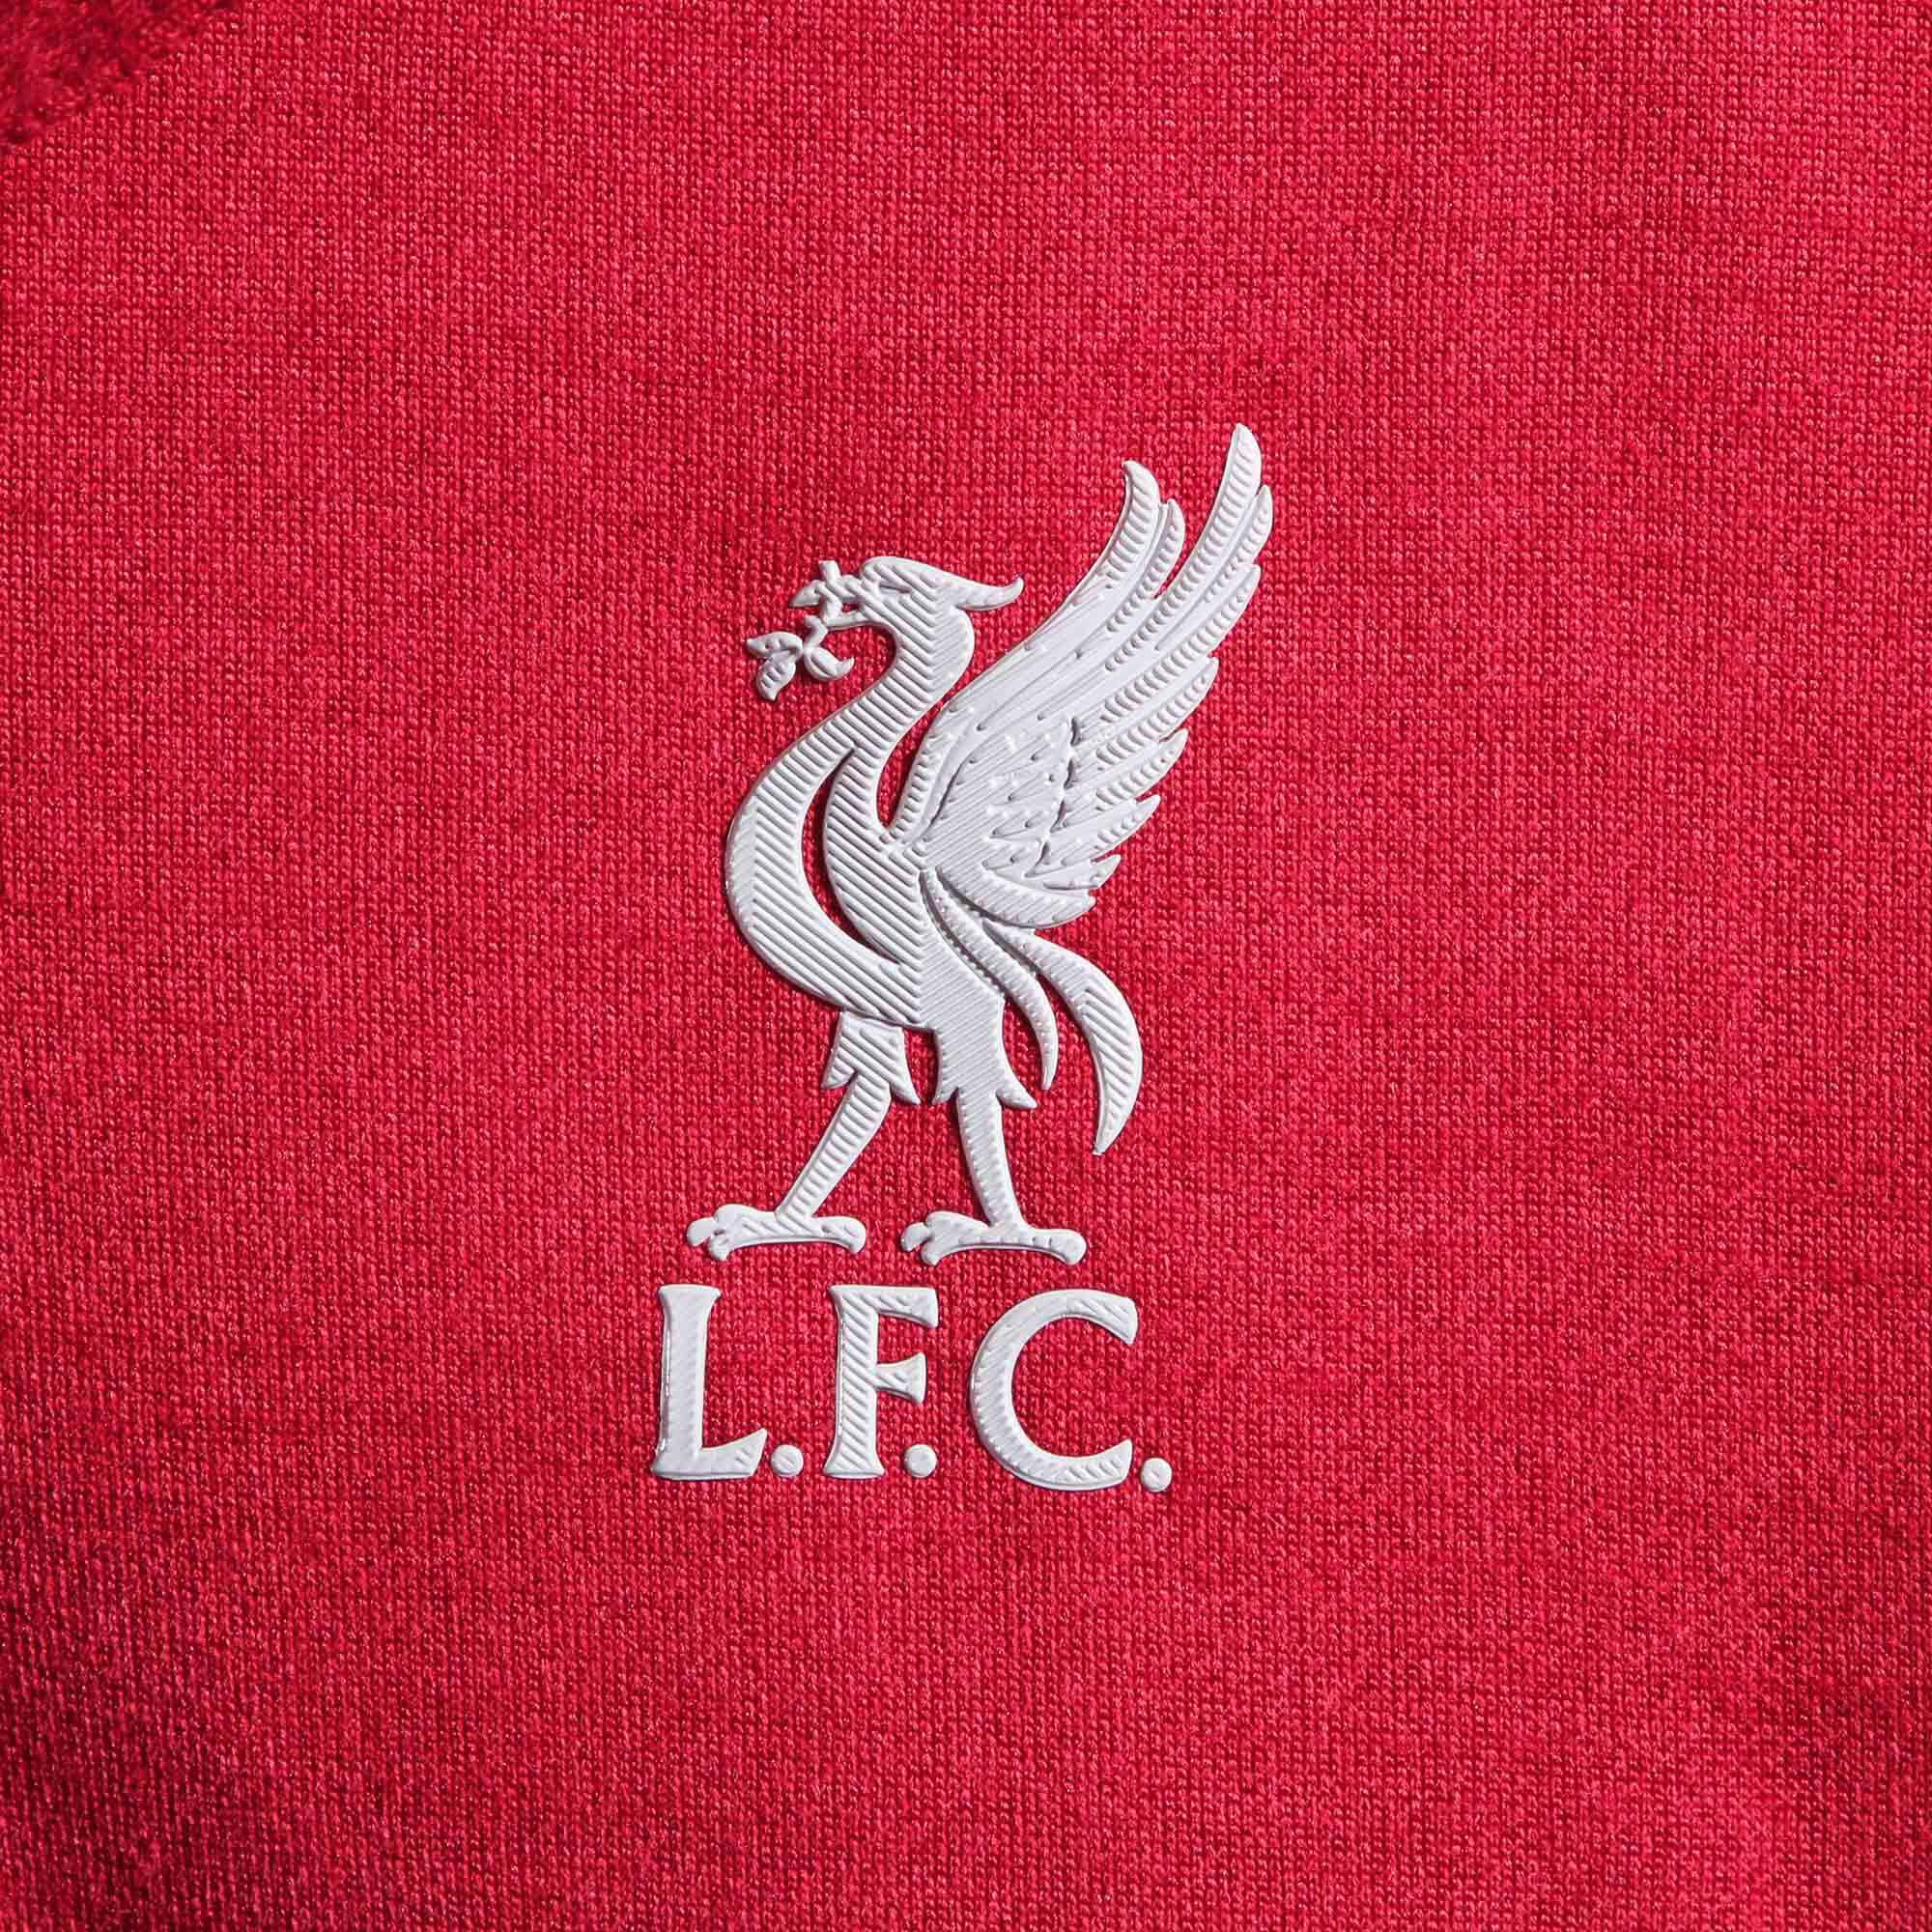 38cf6b78f91 Levelwear - Liverpool Levelwear Sway Corner Polo - Red - Walmart.com